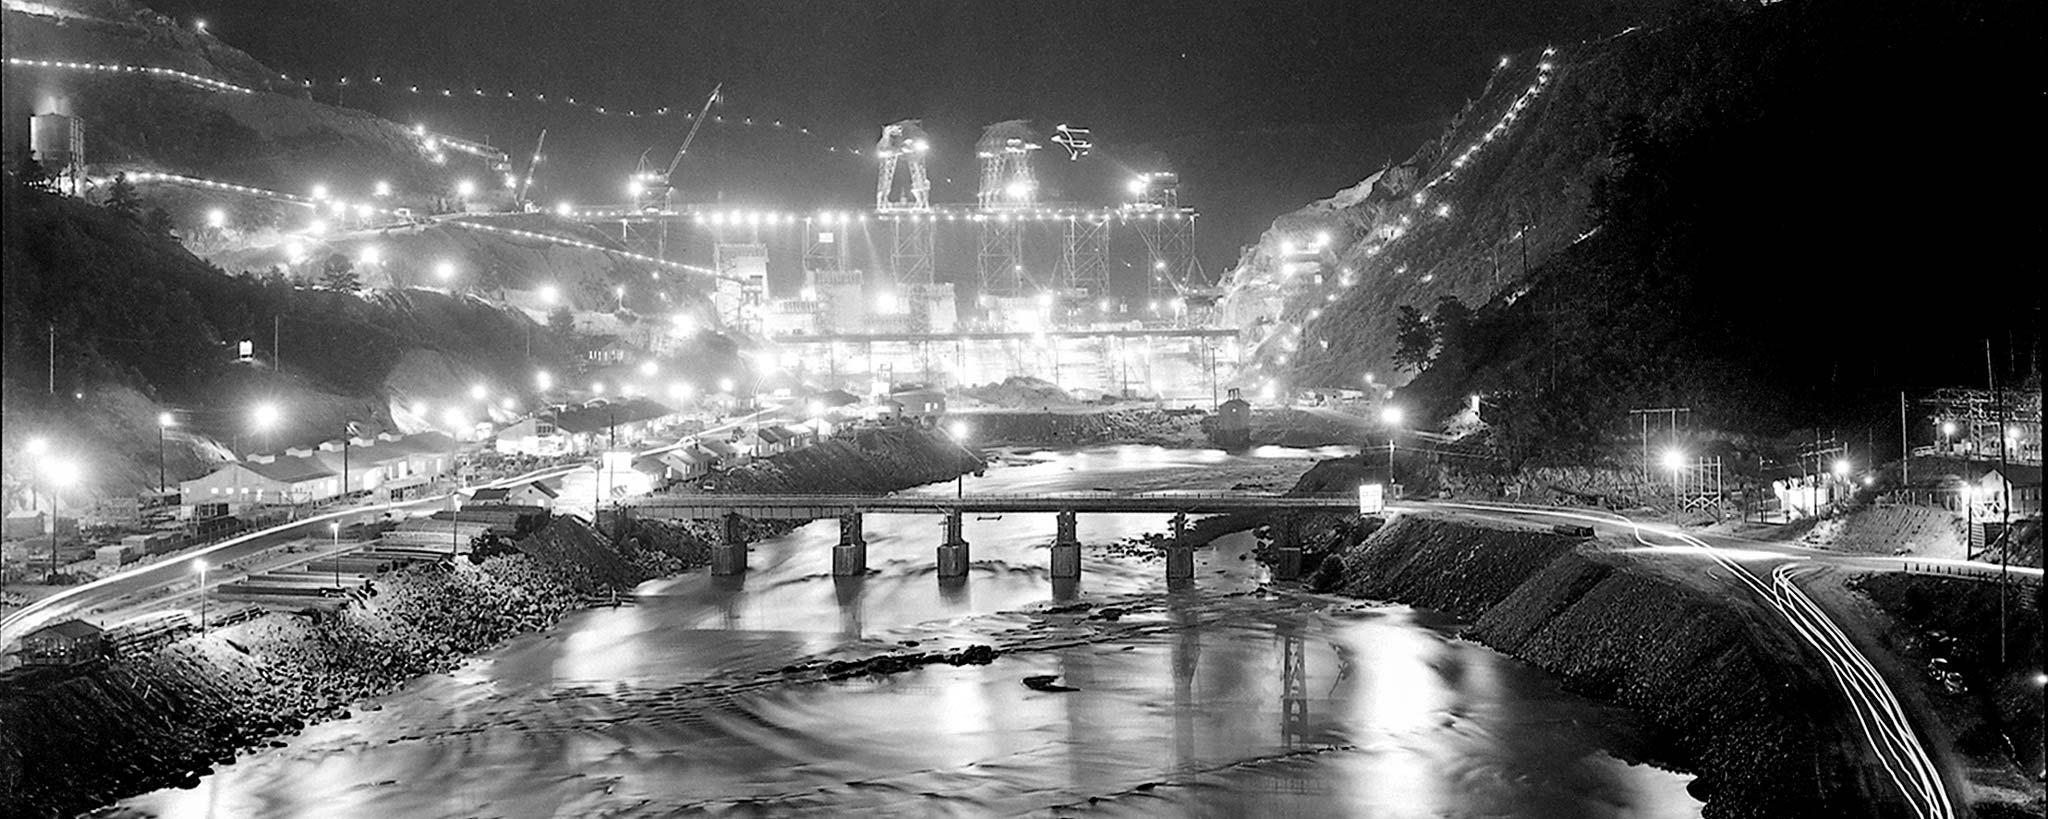 dam construction at night